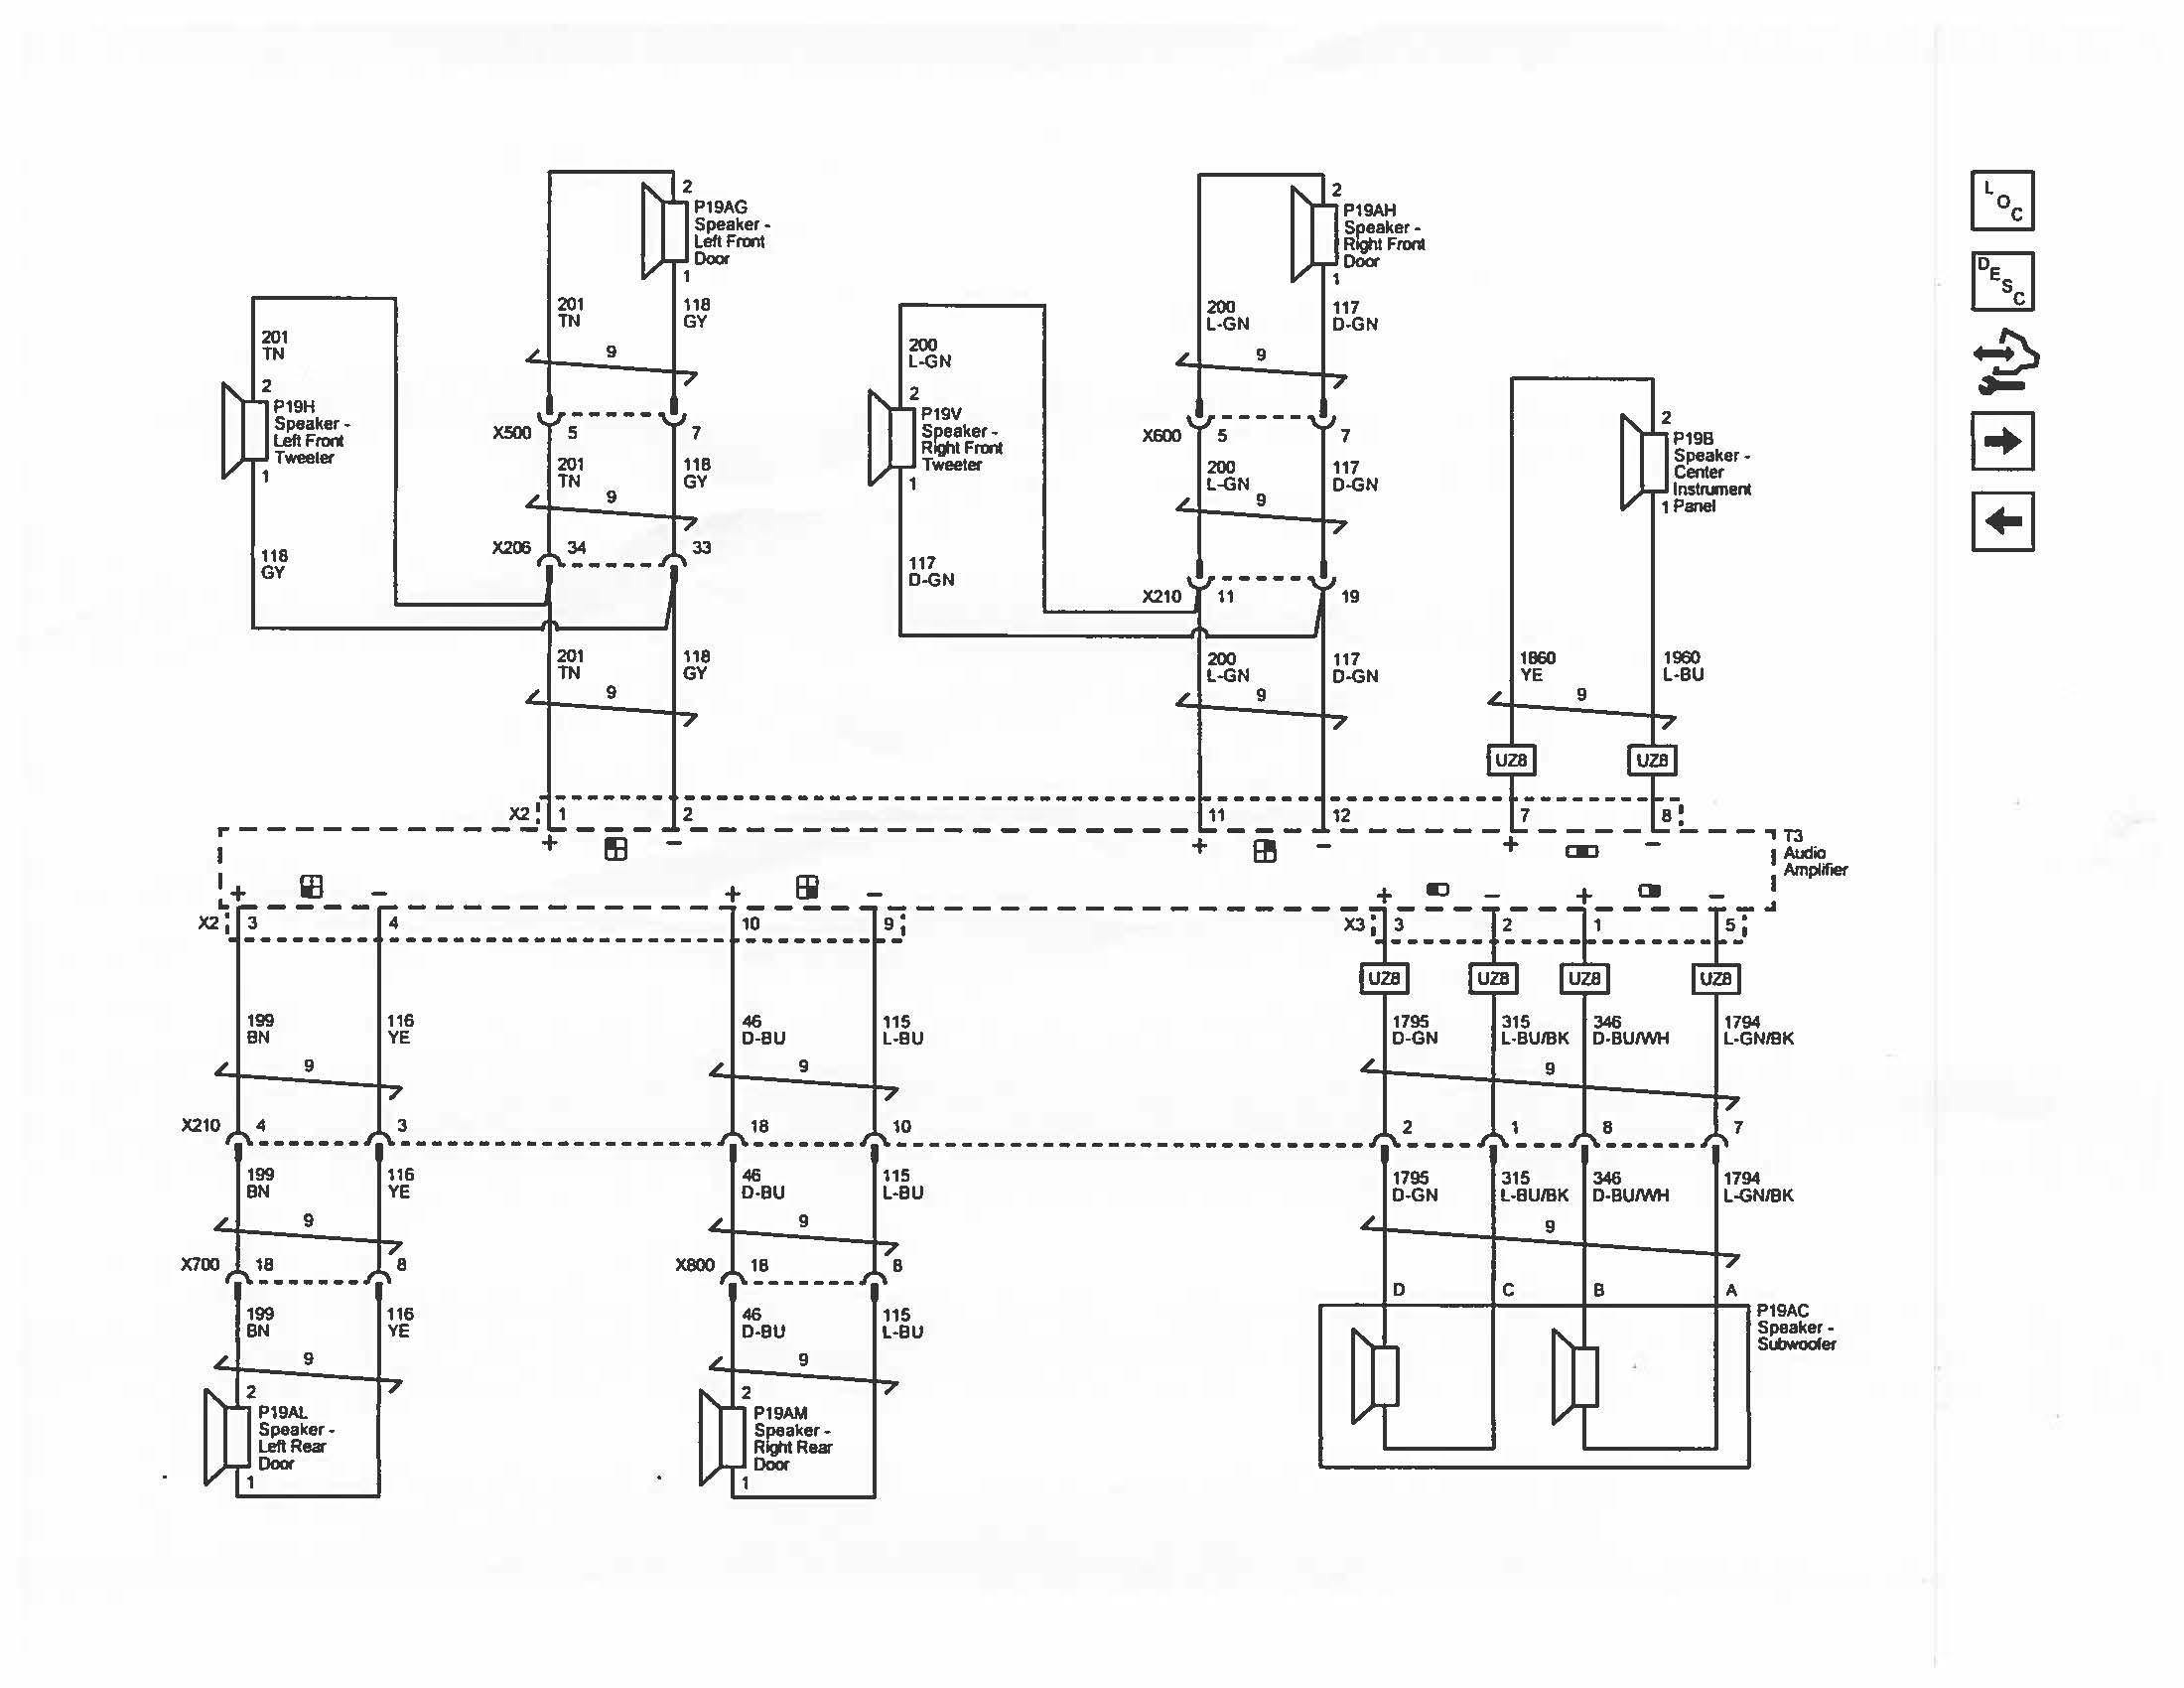 2015 Equinox LT Factory Amp Wiring | GMC Terrain, Equinox, and SRX Forum | 2015 Chevrolet Equinox Wiring Diagrams |  | GMC Terrain forum